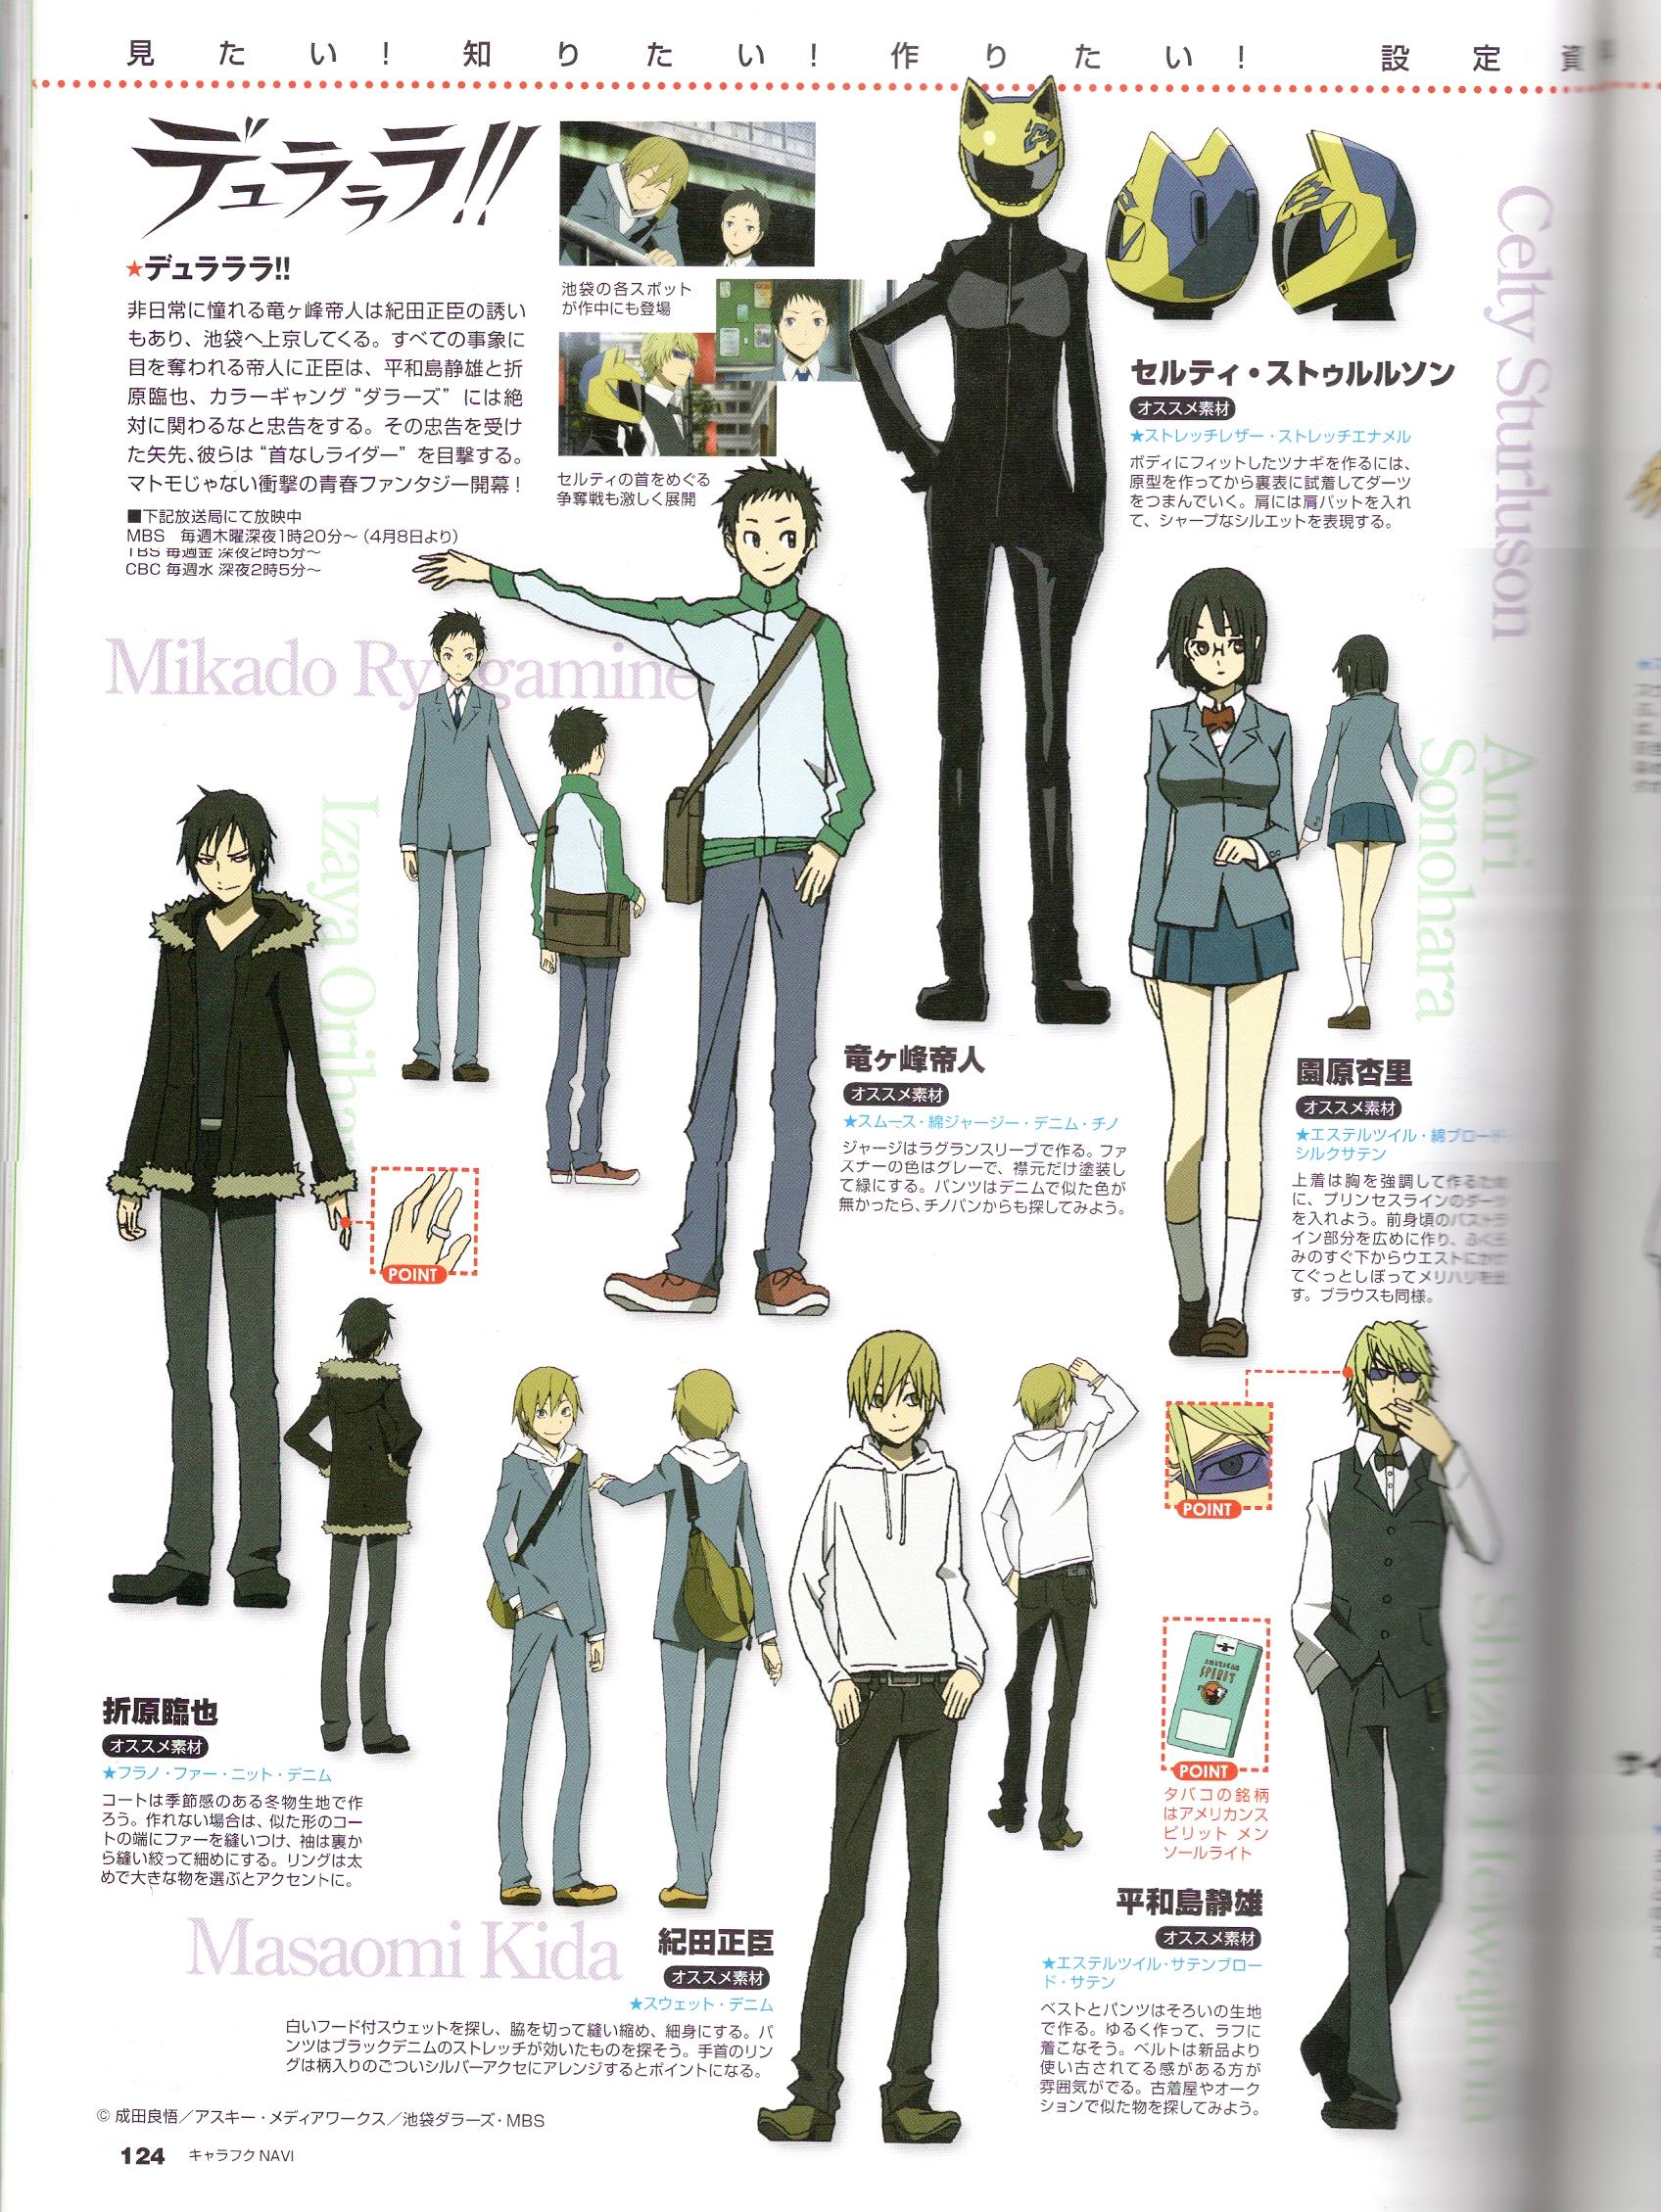 DURARARA!! Image #805143 - Zerochan Anime Image Board | 1696 x 2259 jpeg 2013kB